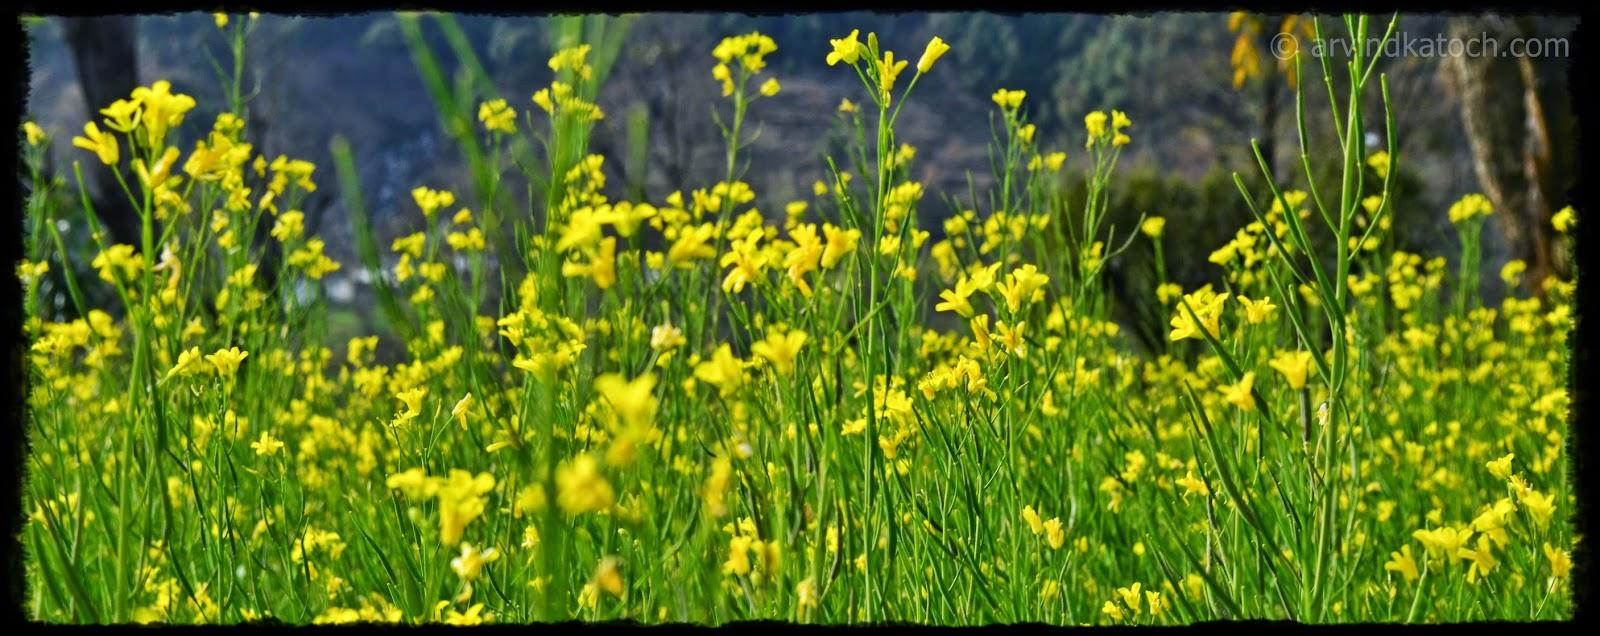 Mustard, Mustard Flowers, Yellow Flowers